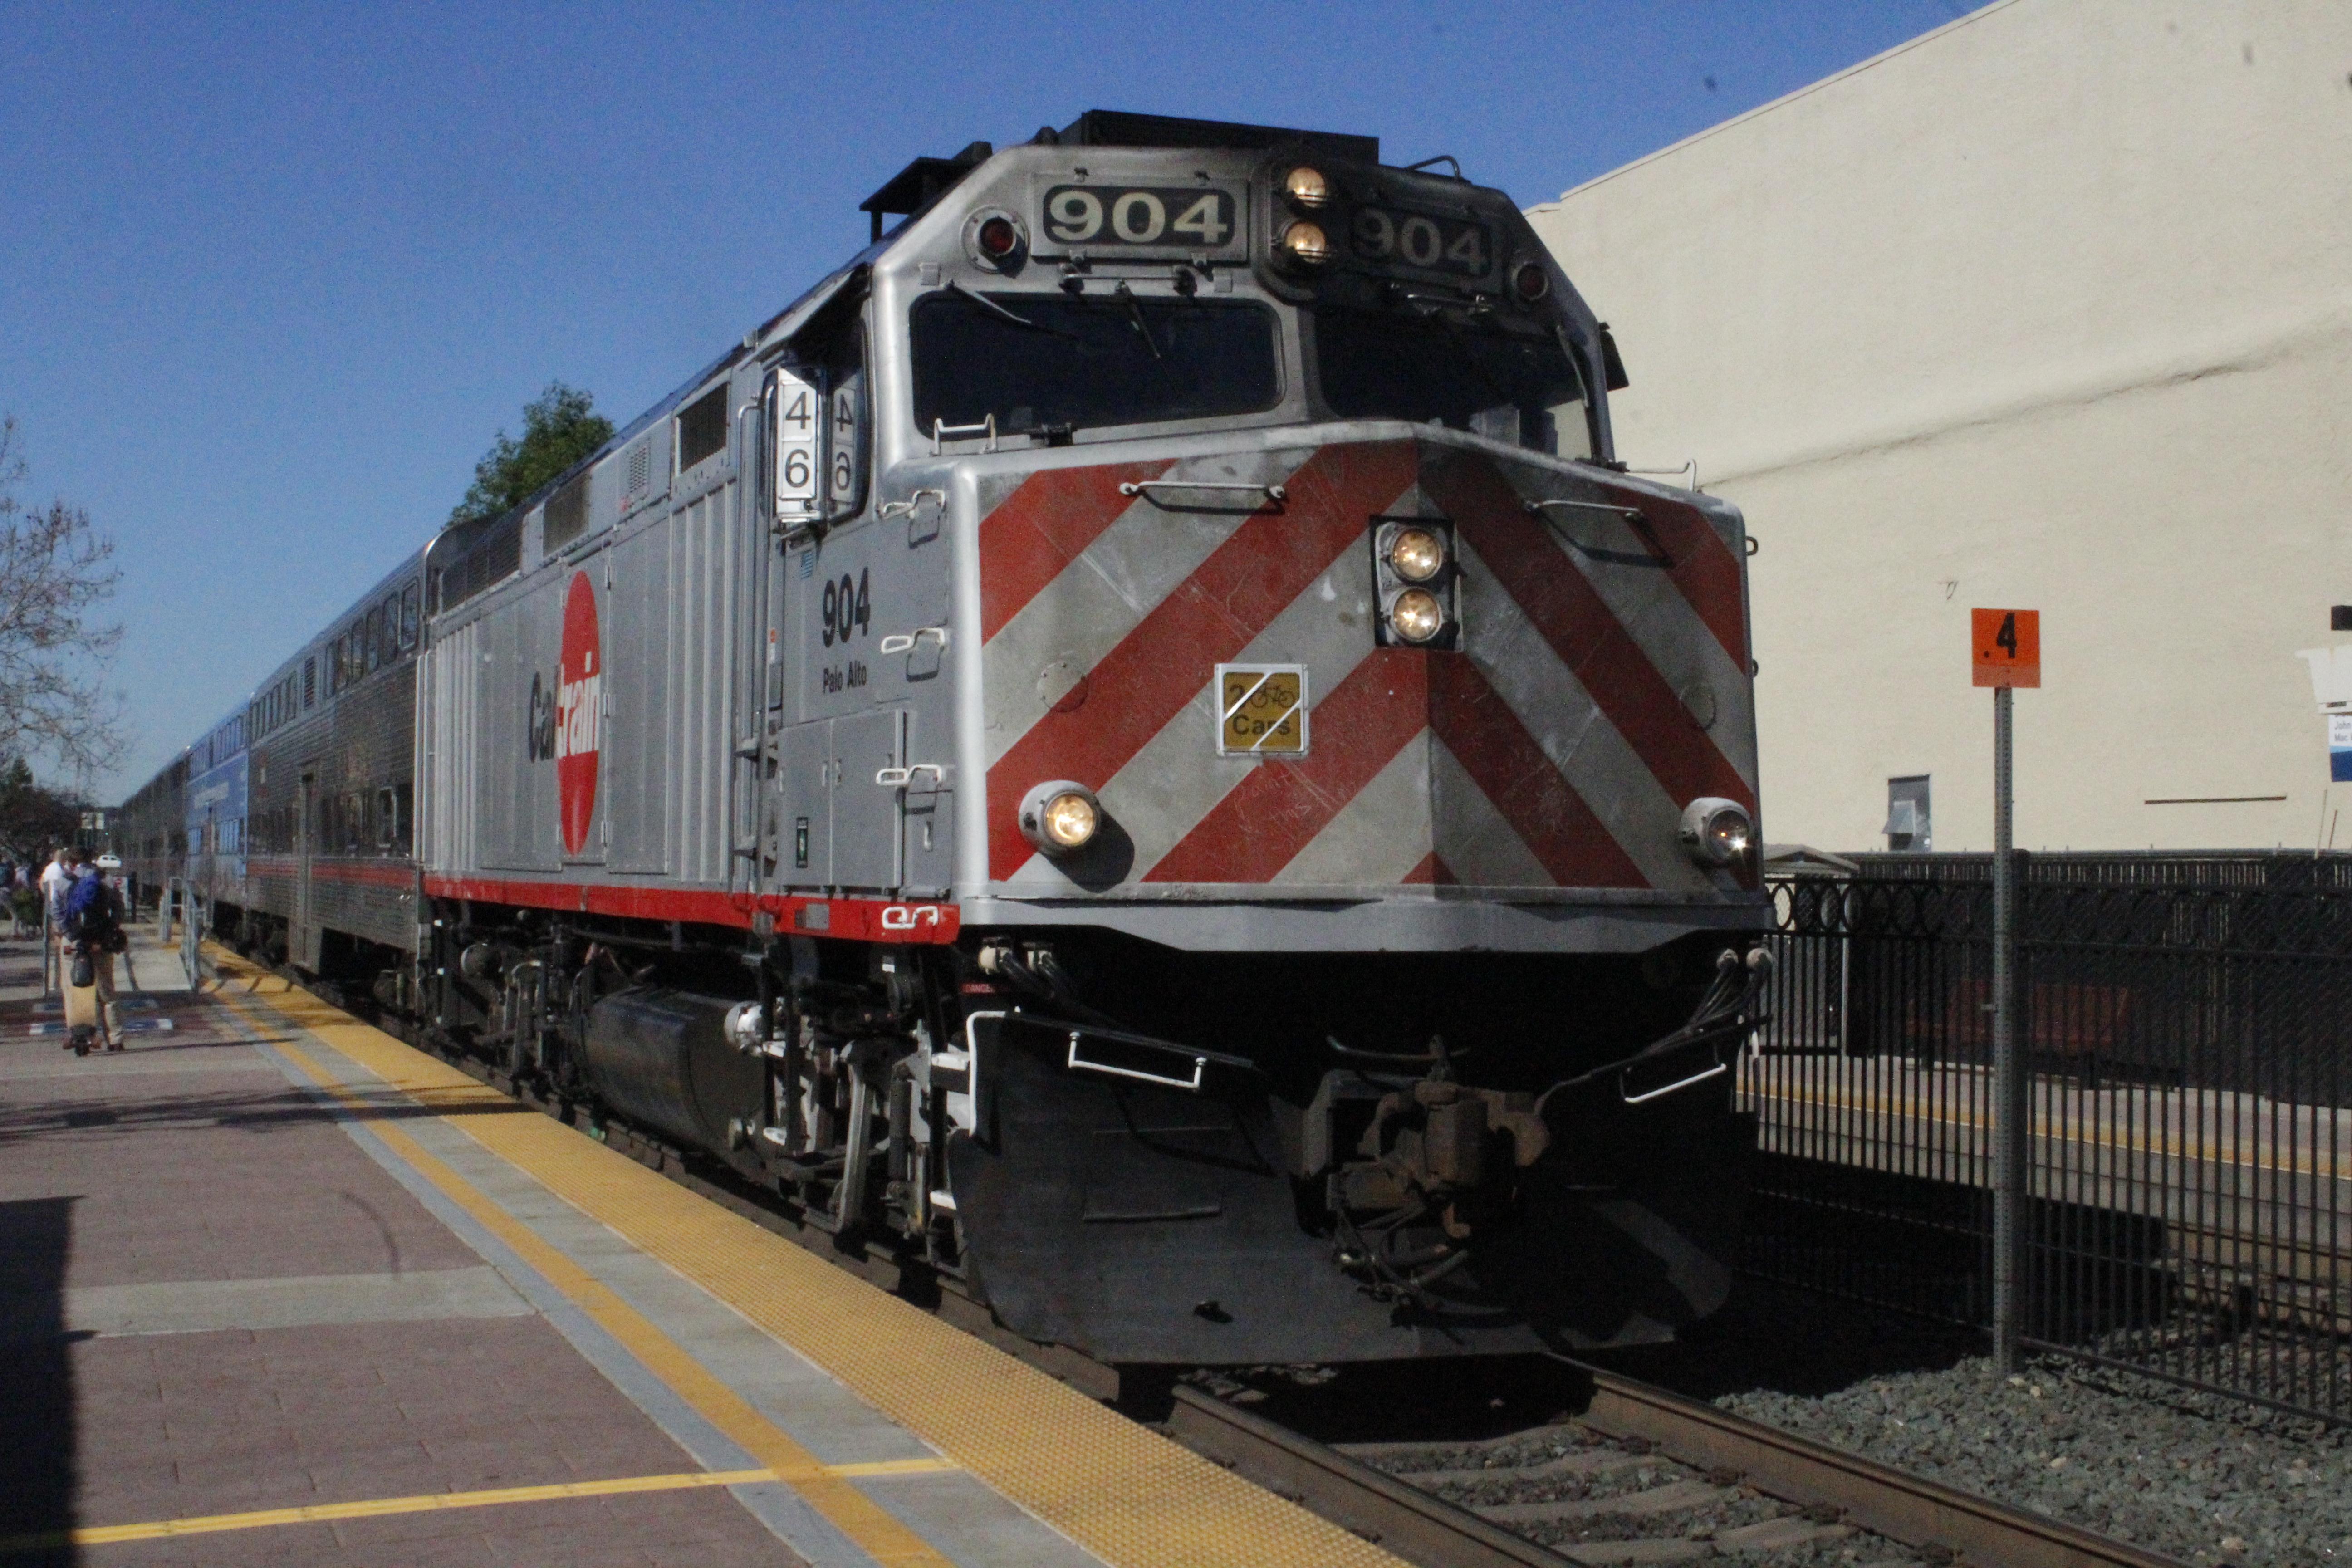 Caltrain locomotive unit 904, Palo Alto, bound for San Jose at Redwood City Station